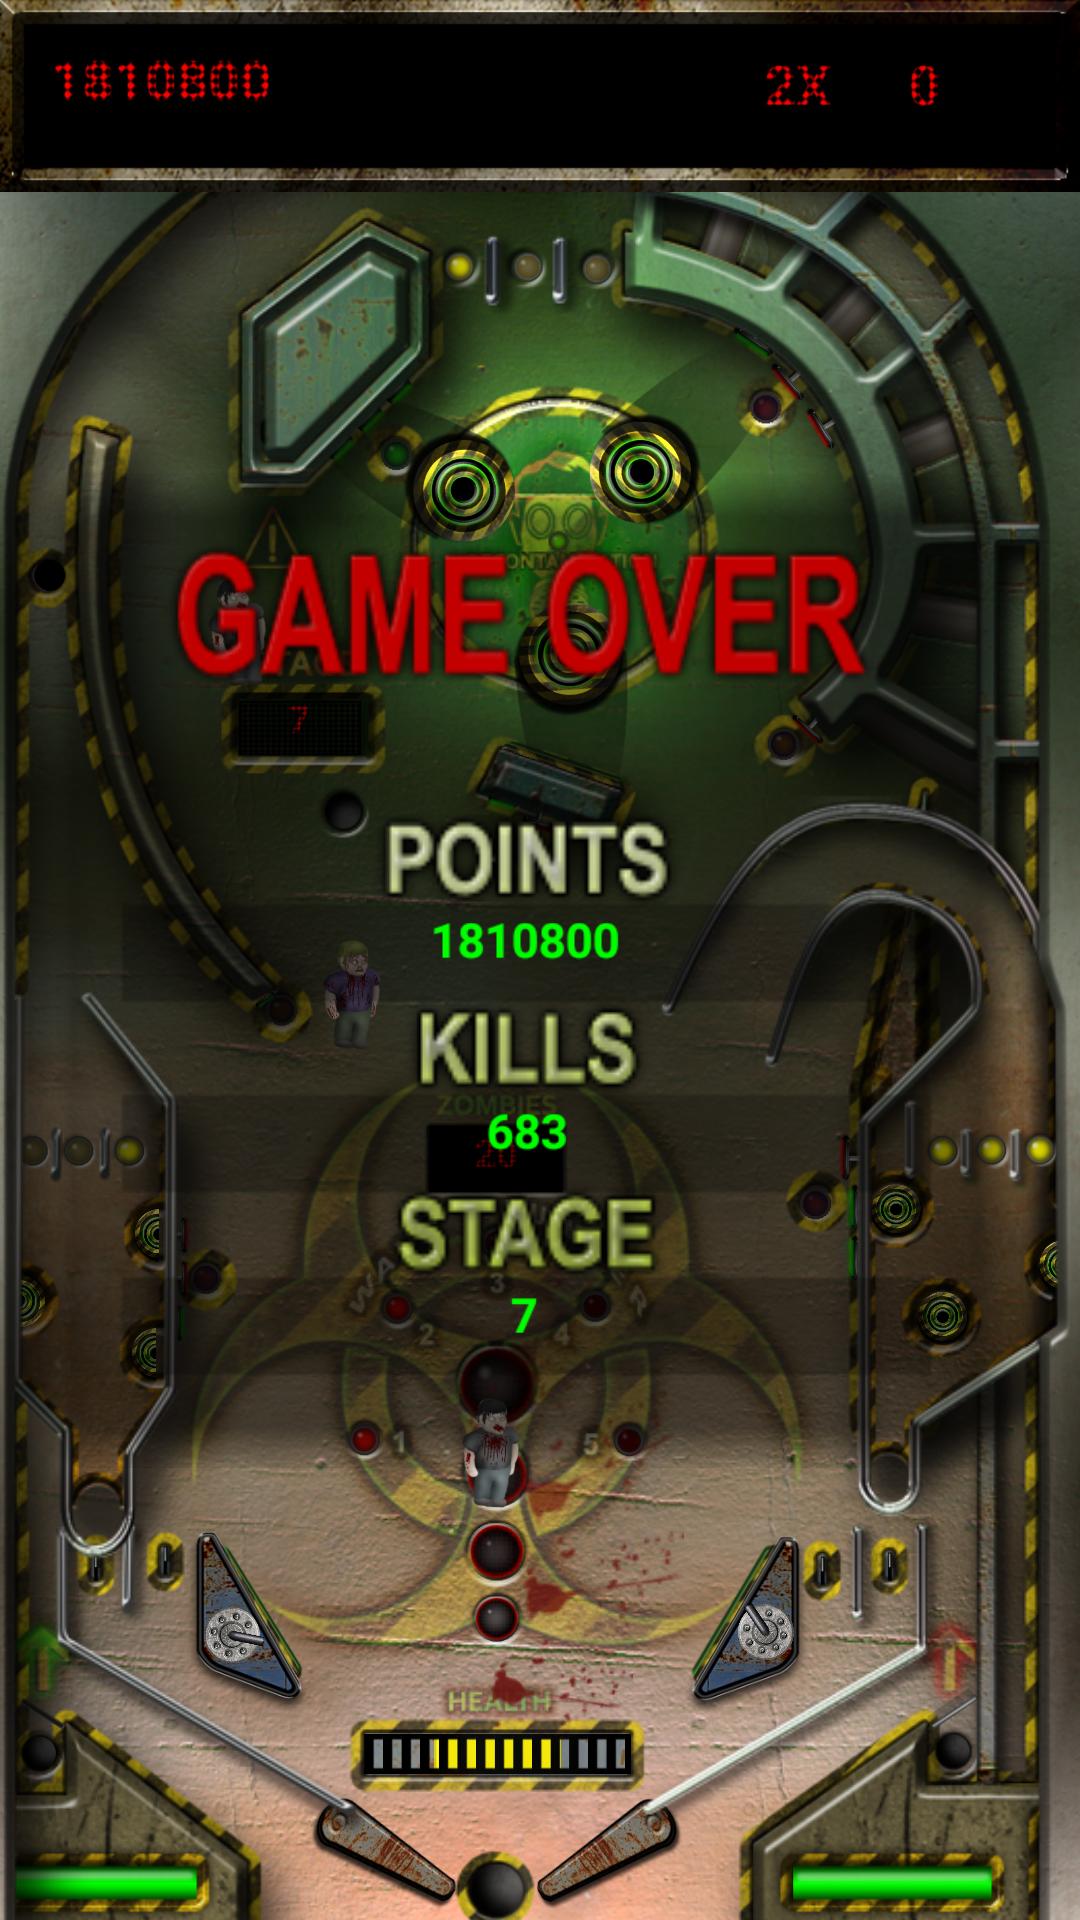 Mantalow: Zombie Smash Pinball (Android) 1,810,800 points on 2015-10-26 07:27:28